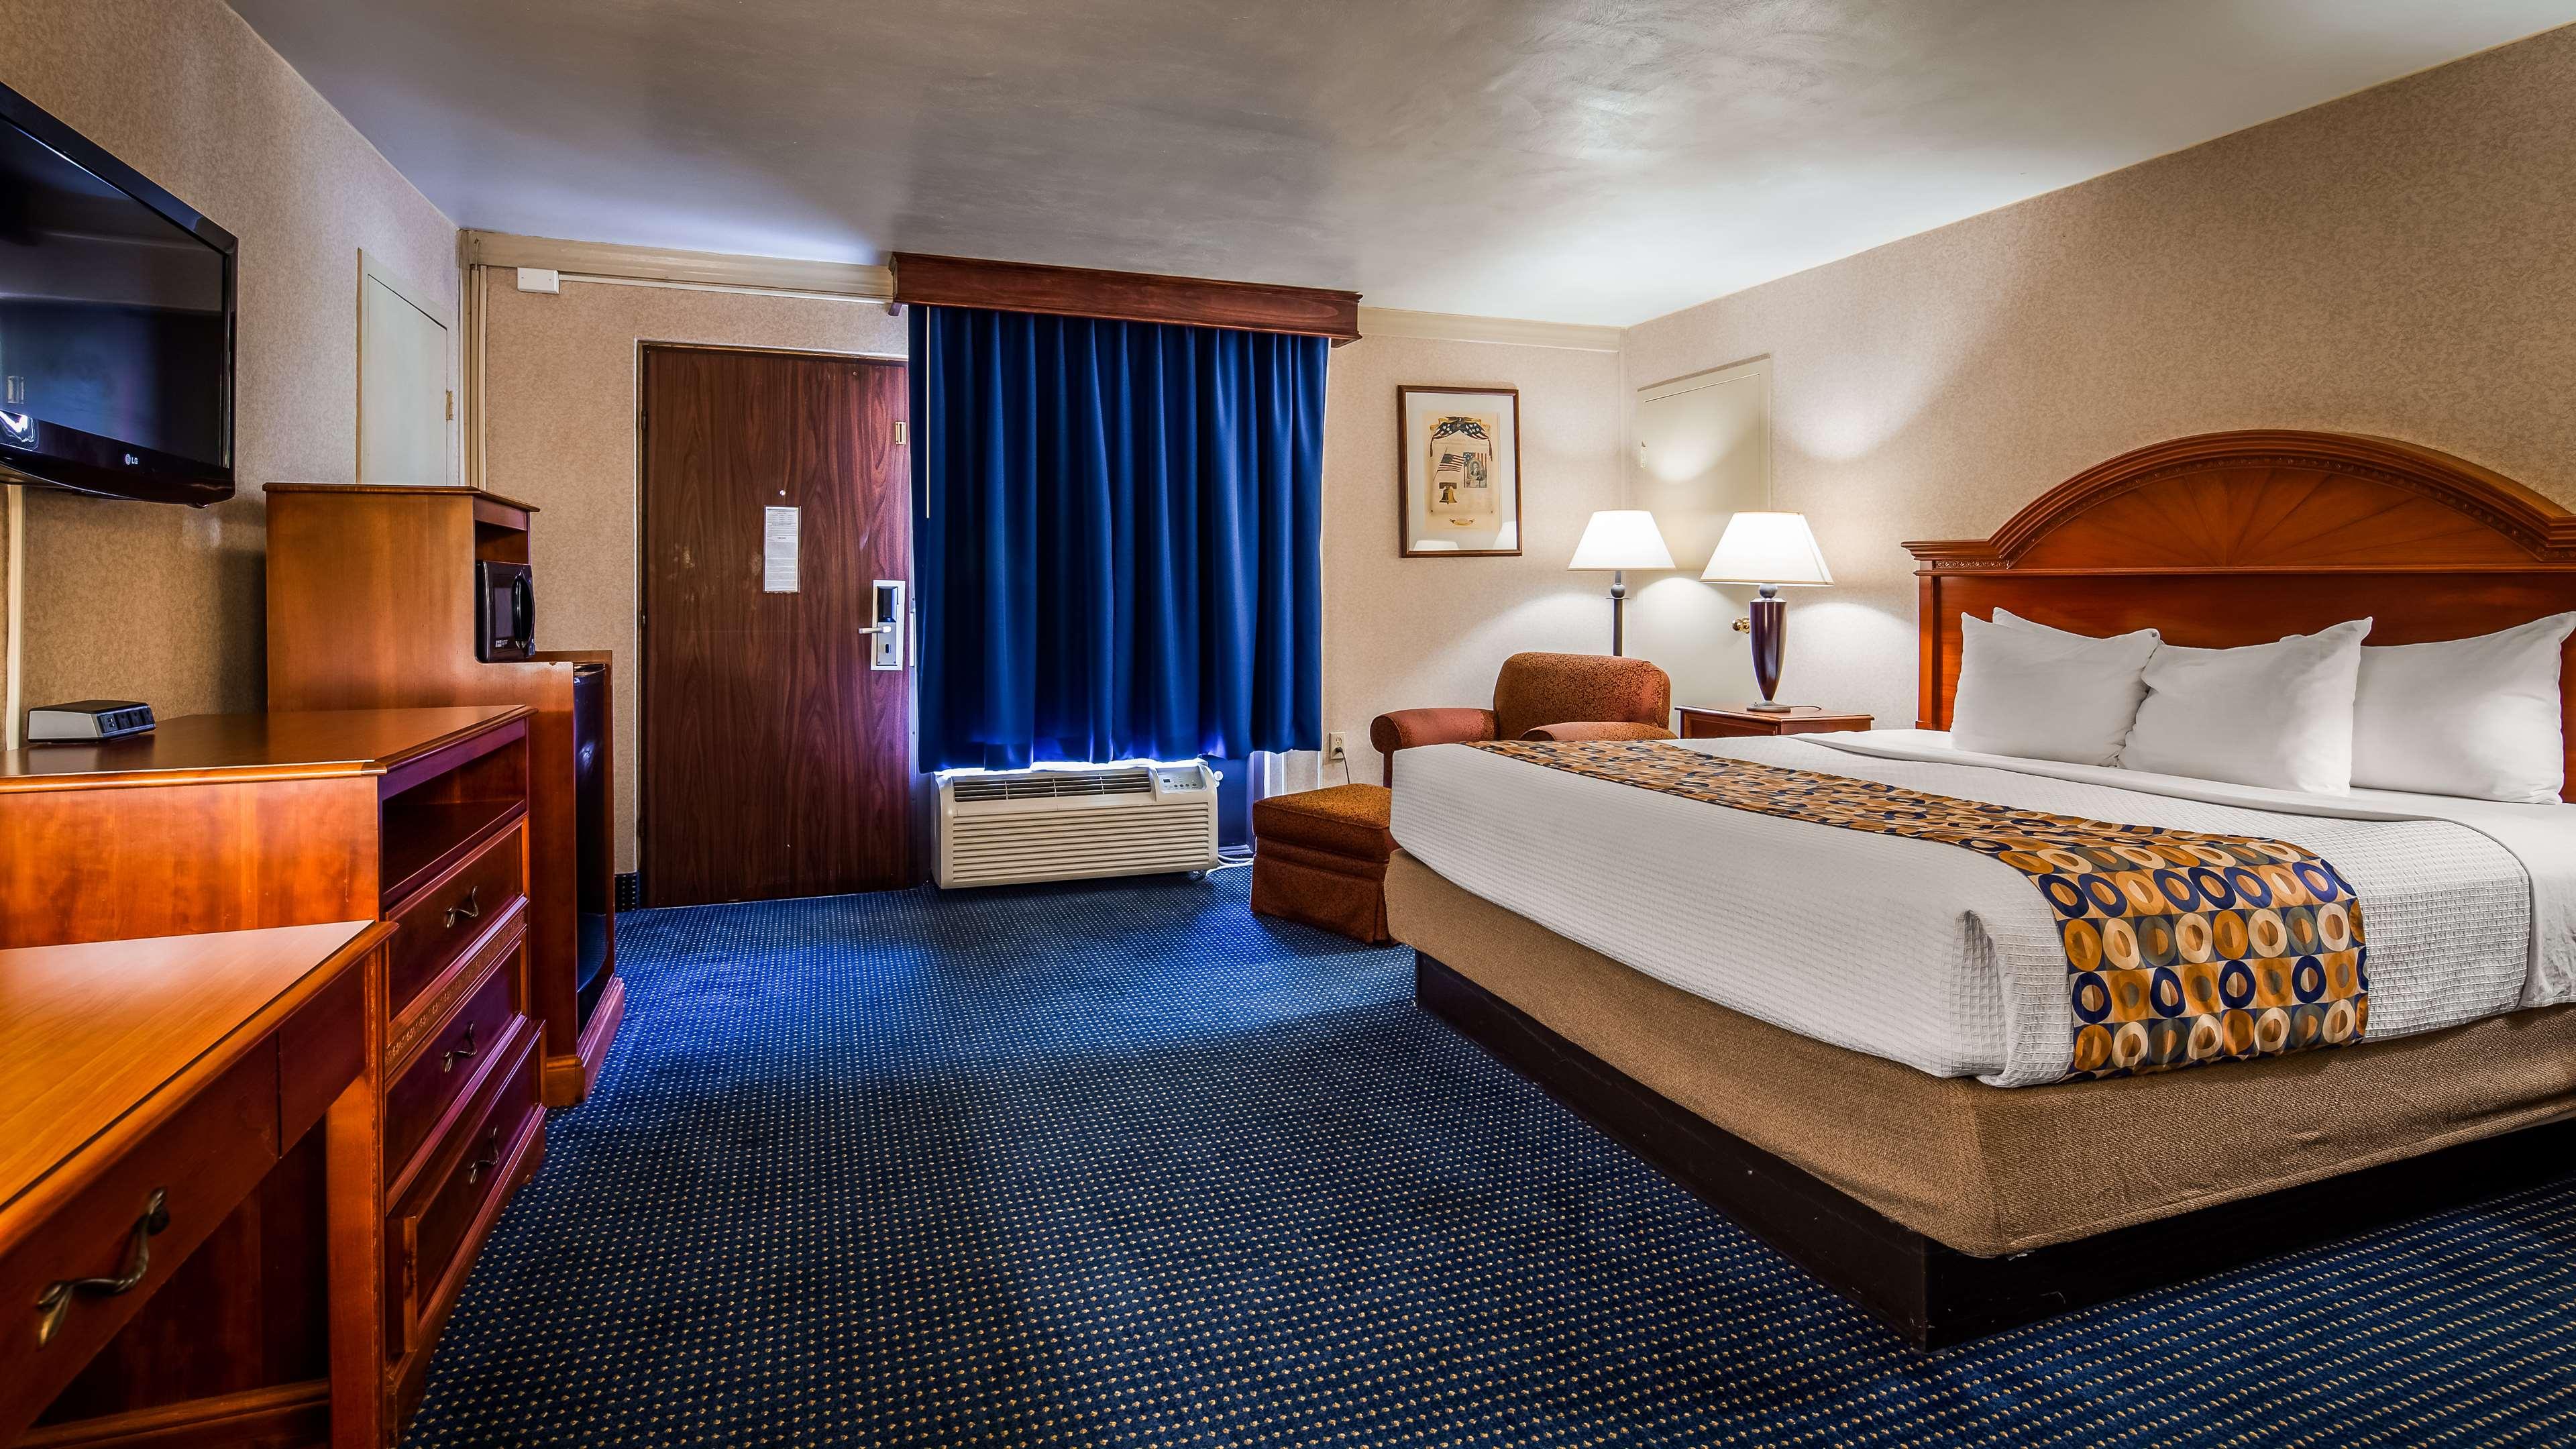 Best Western Pentagon Hotel - Reagan Airport image 17